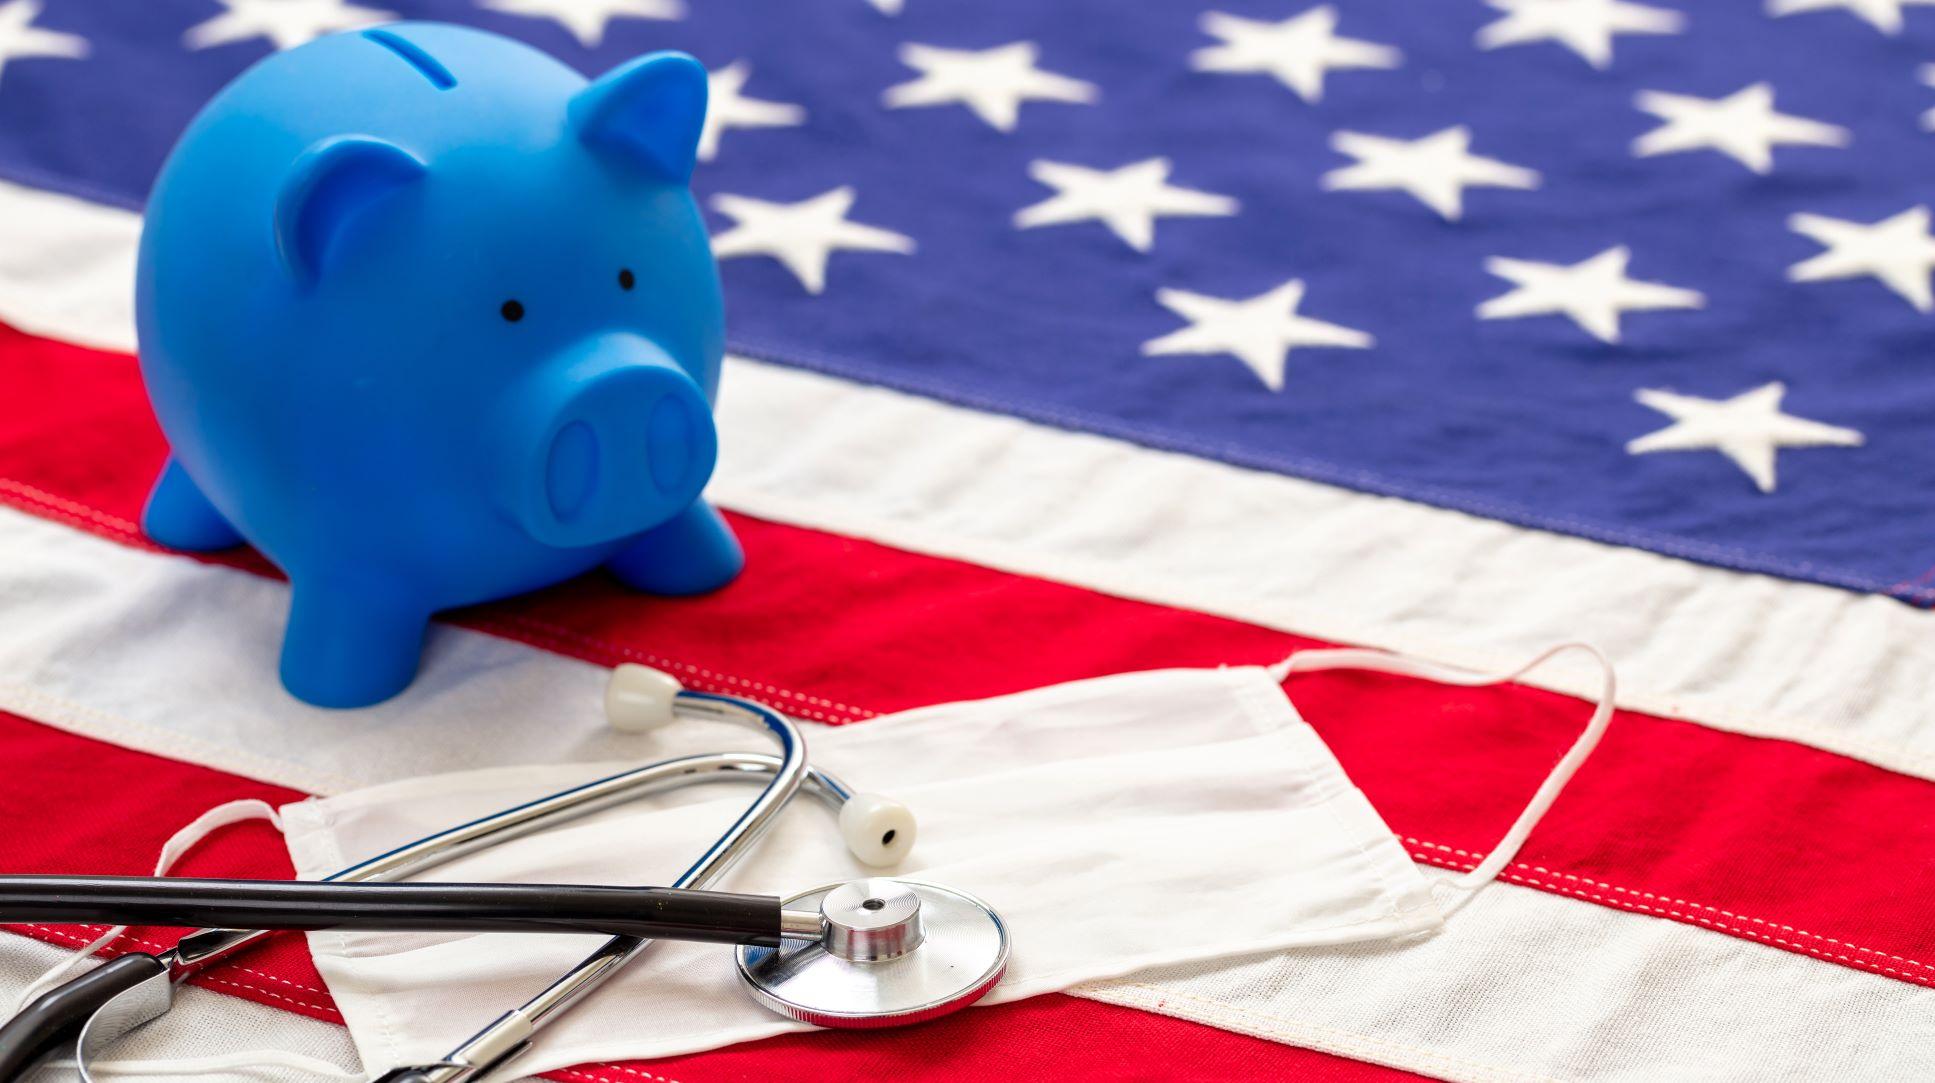 USA medical budget